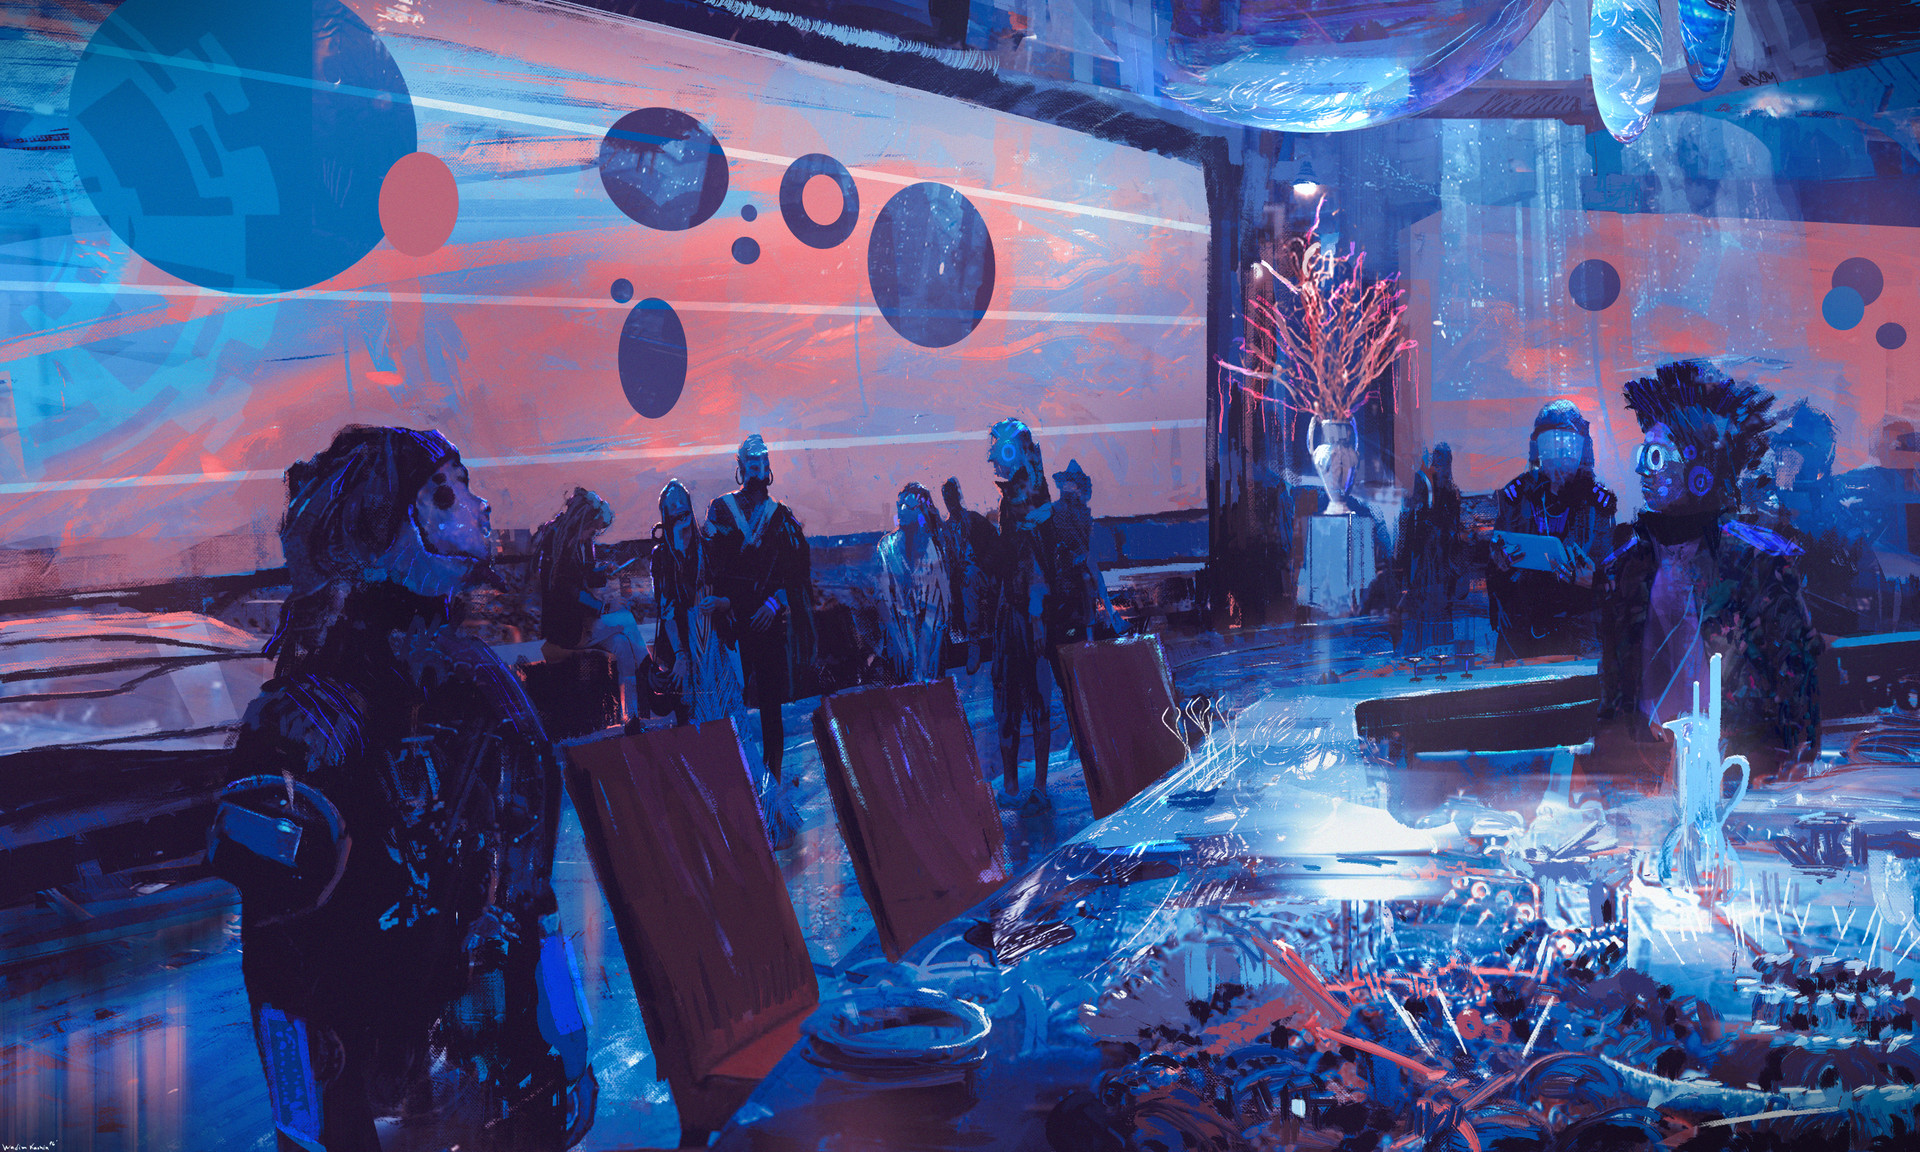 General 1920x1152 cyber cyberpunk bar futuristic painting